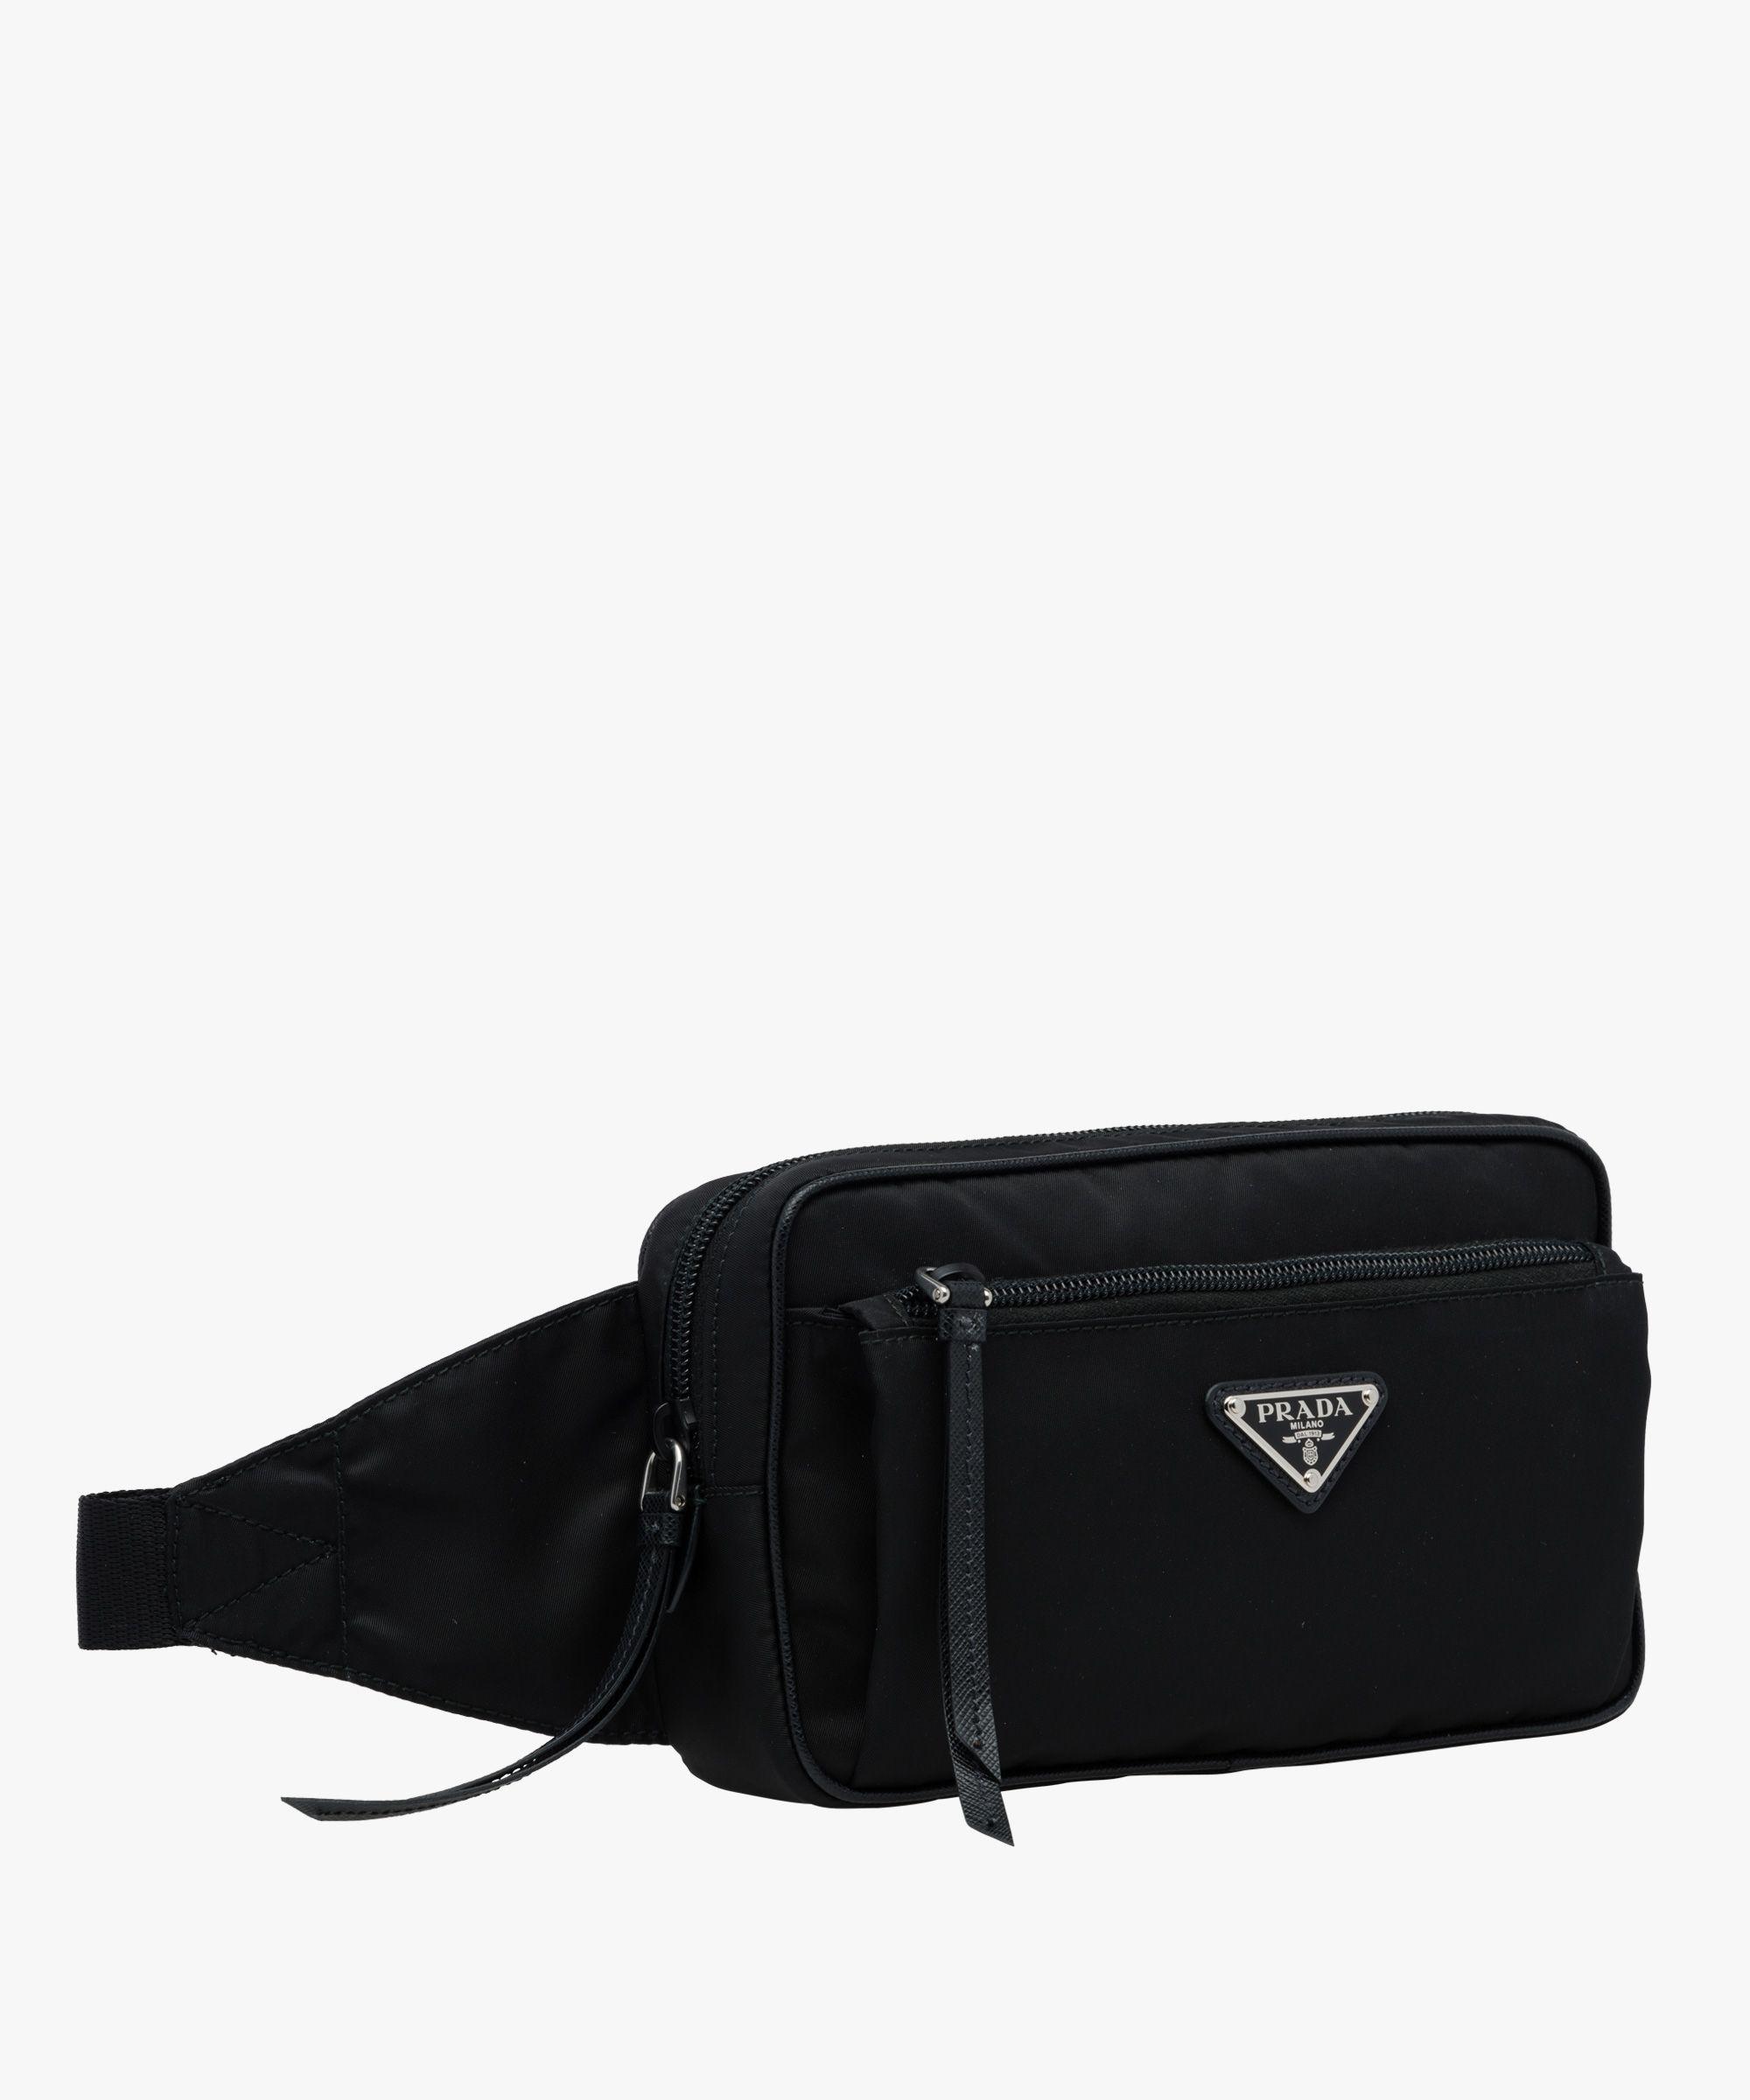 5f6bbb3a995e Prada - Nylon and leather belt bag